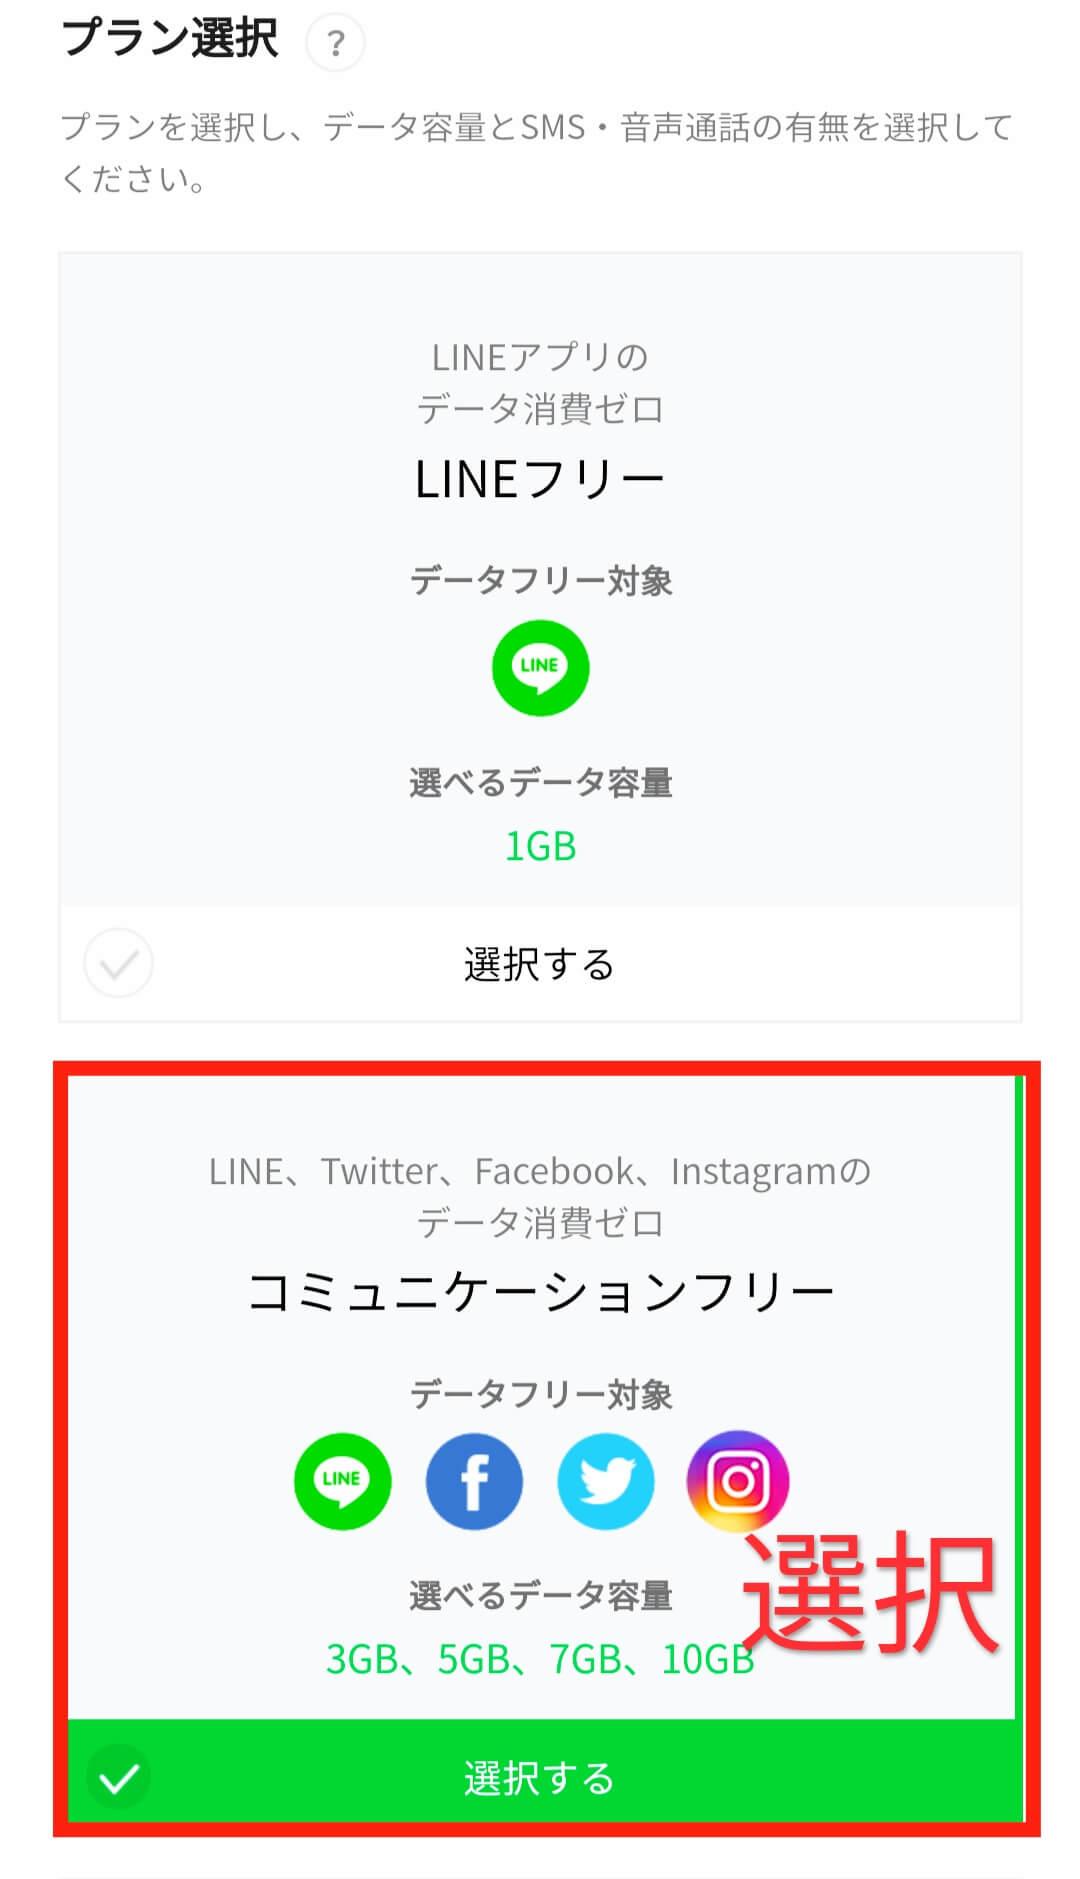 lineモバイルのプラン選択